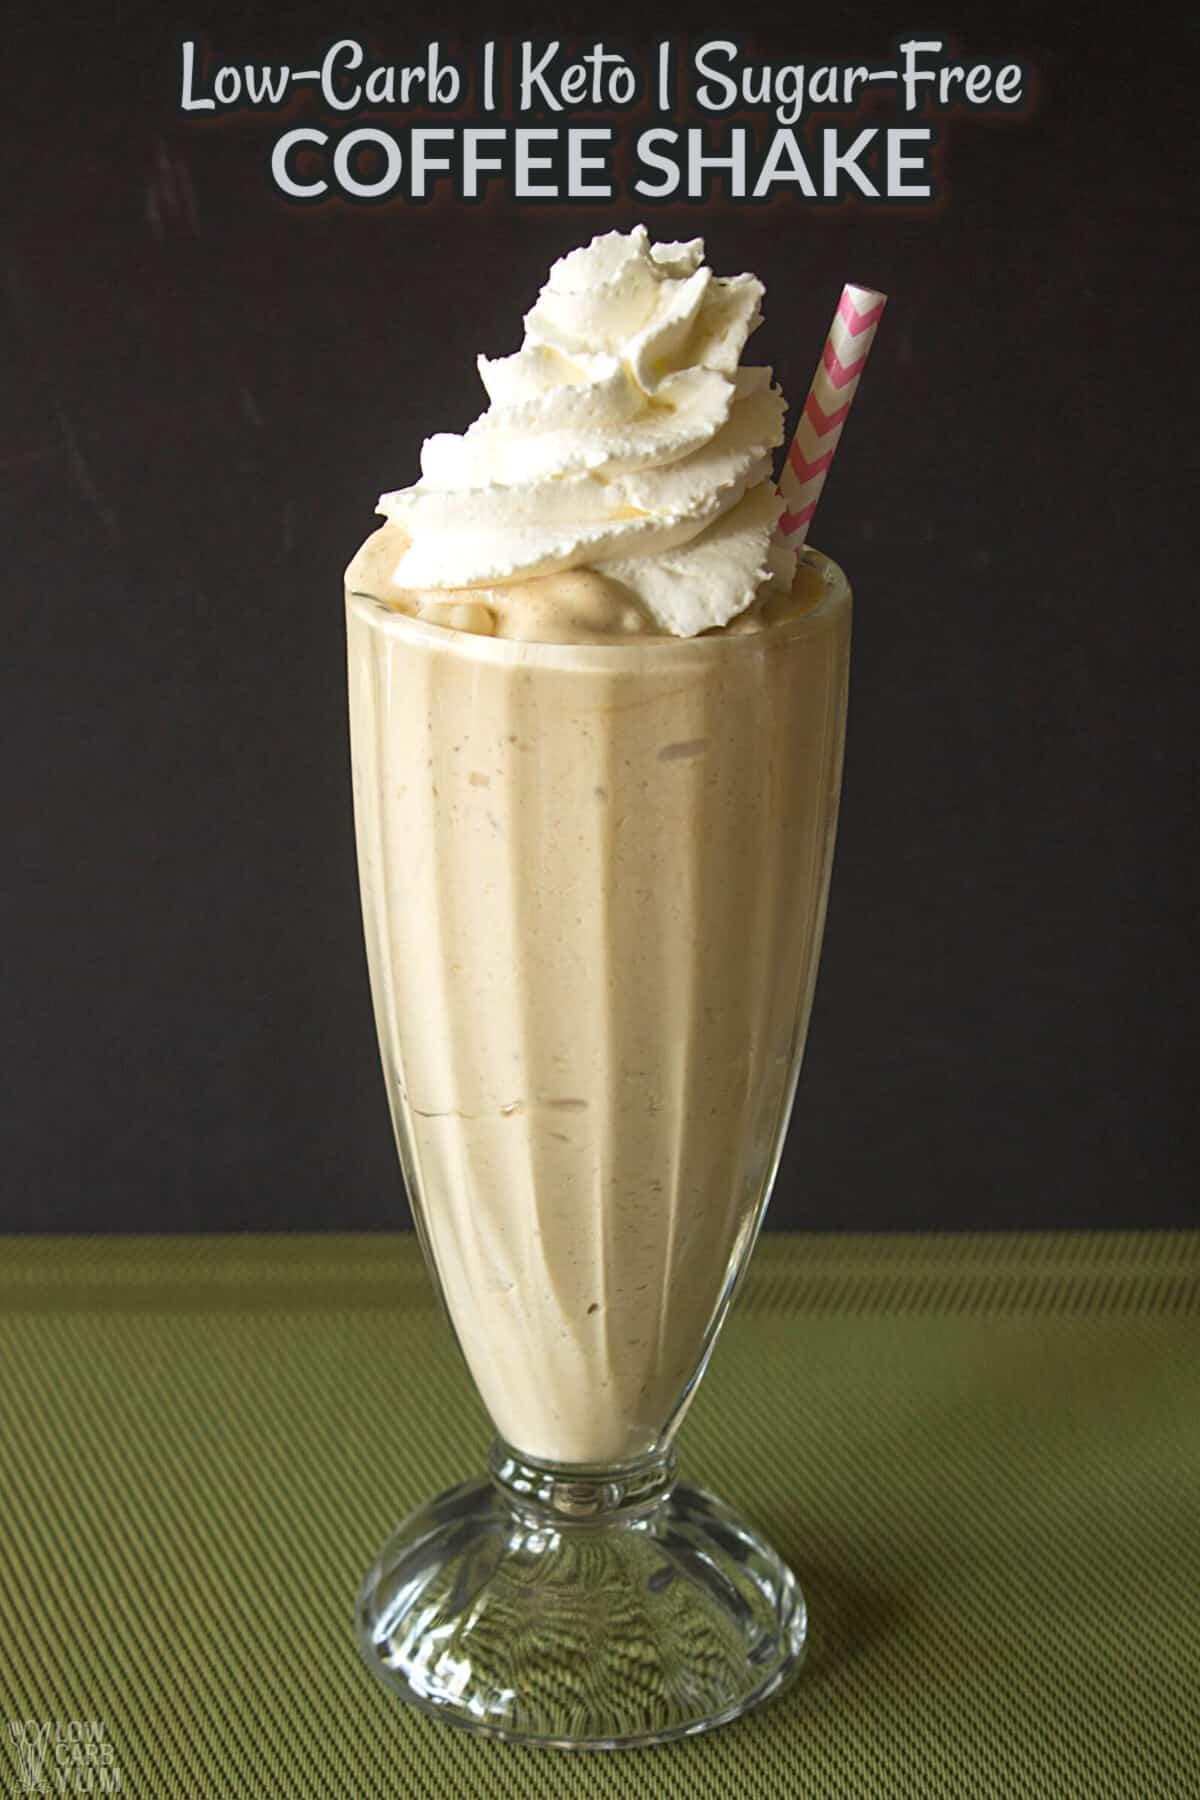 keto coffee shake cover image